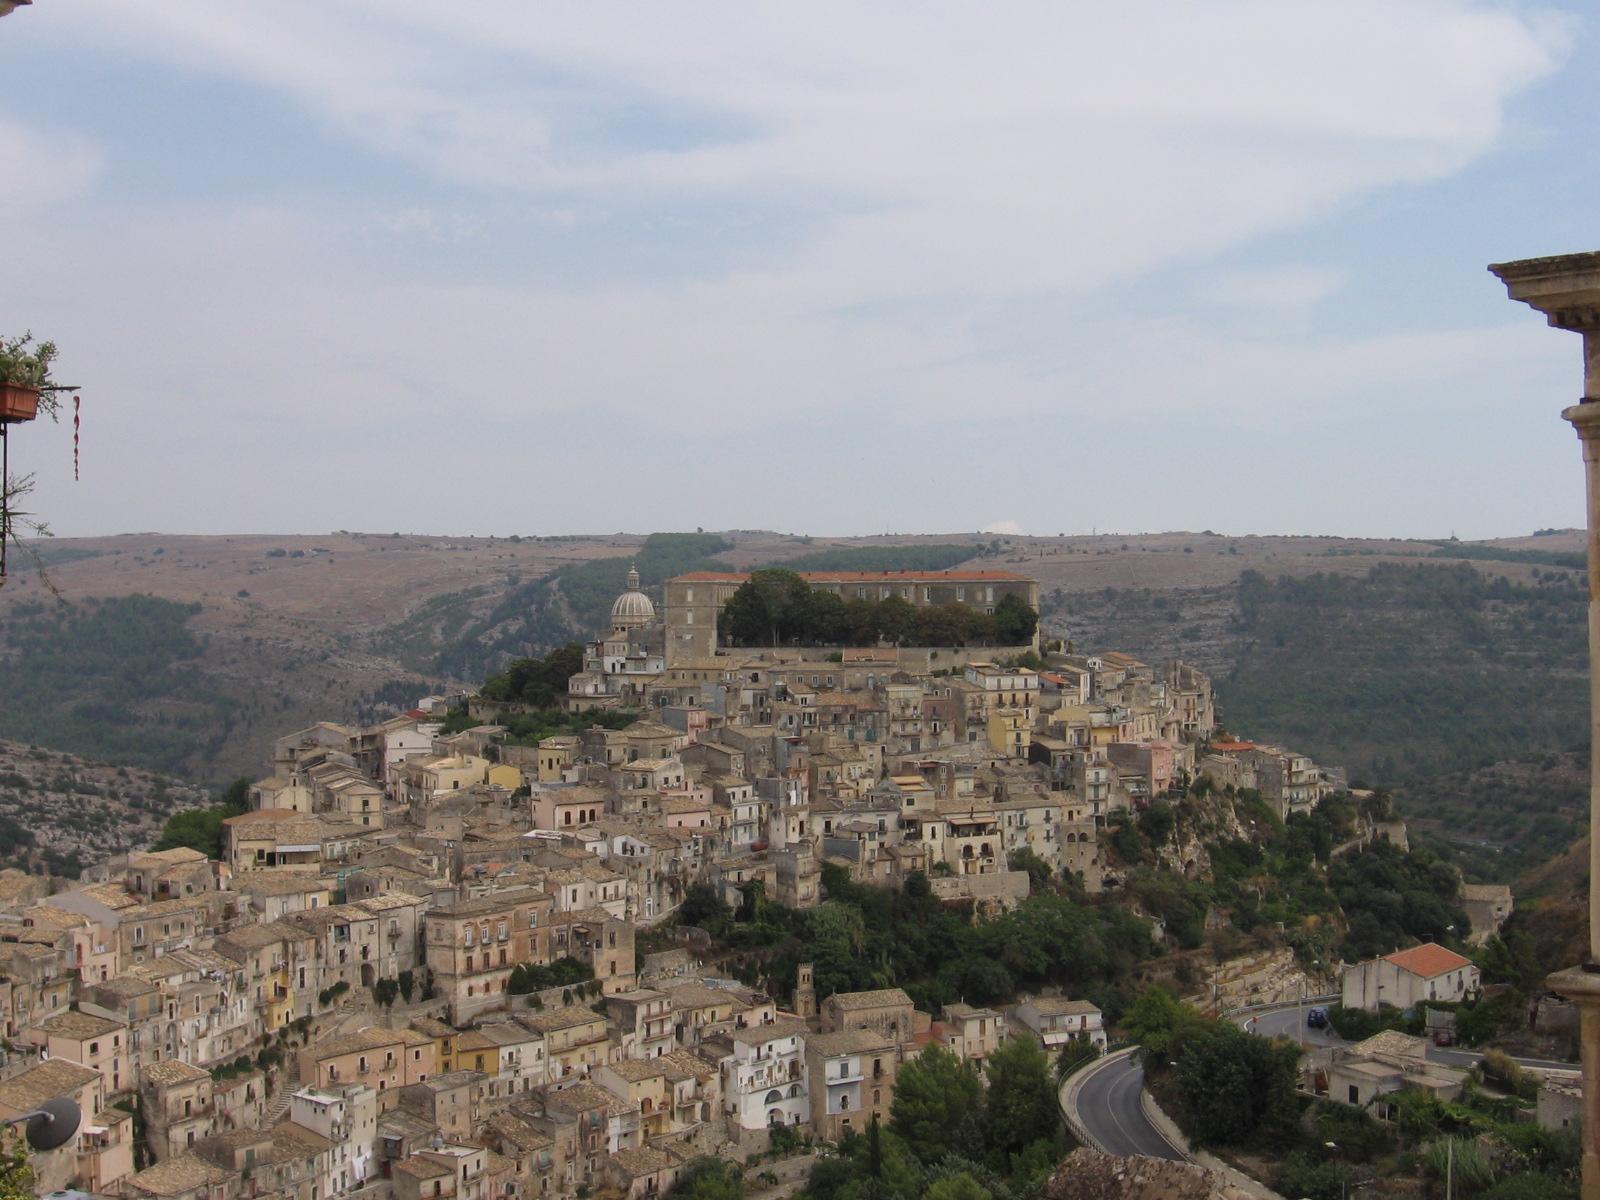 http://www.welton.it/photos/ragusa/ragusa-ibla.jpg